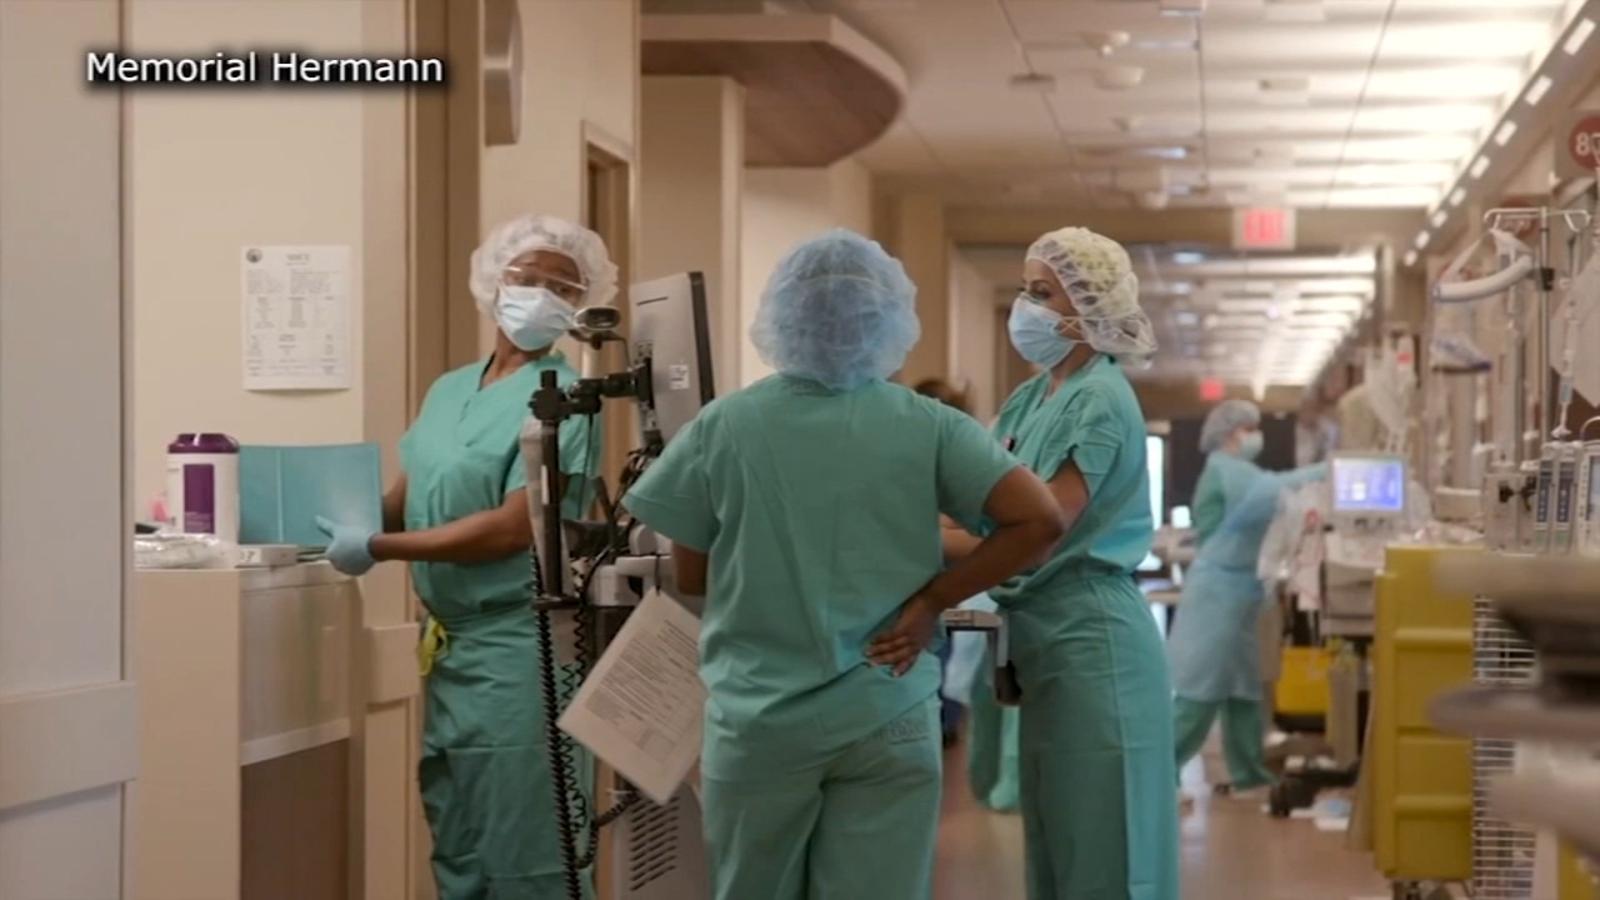 6382623 082120 ktrk marla hospital prep storm covid vid jpg?w=1600.'